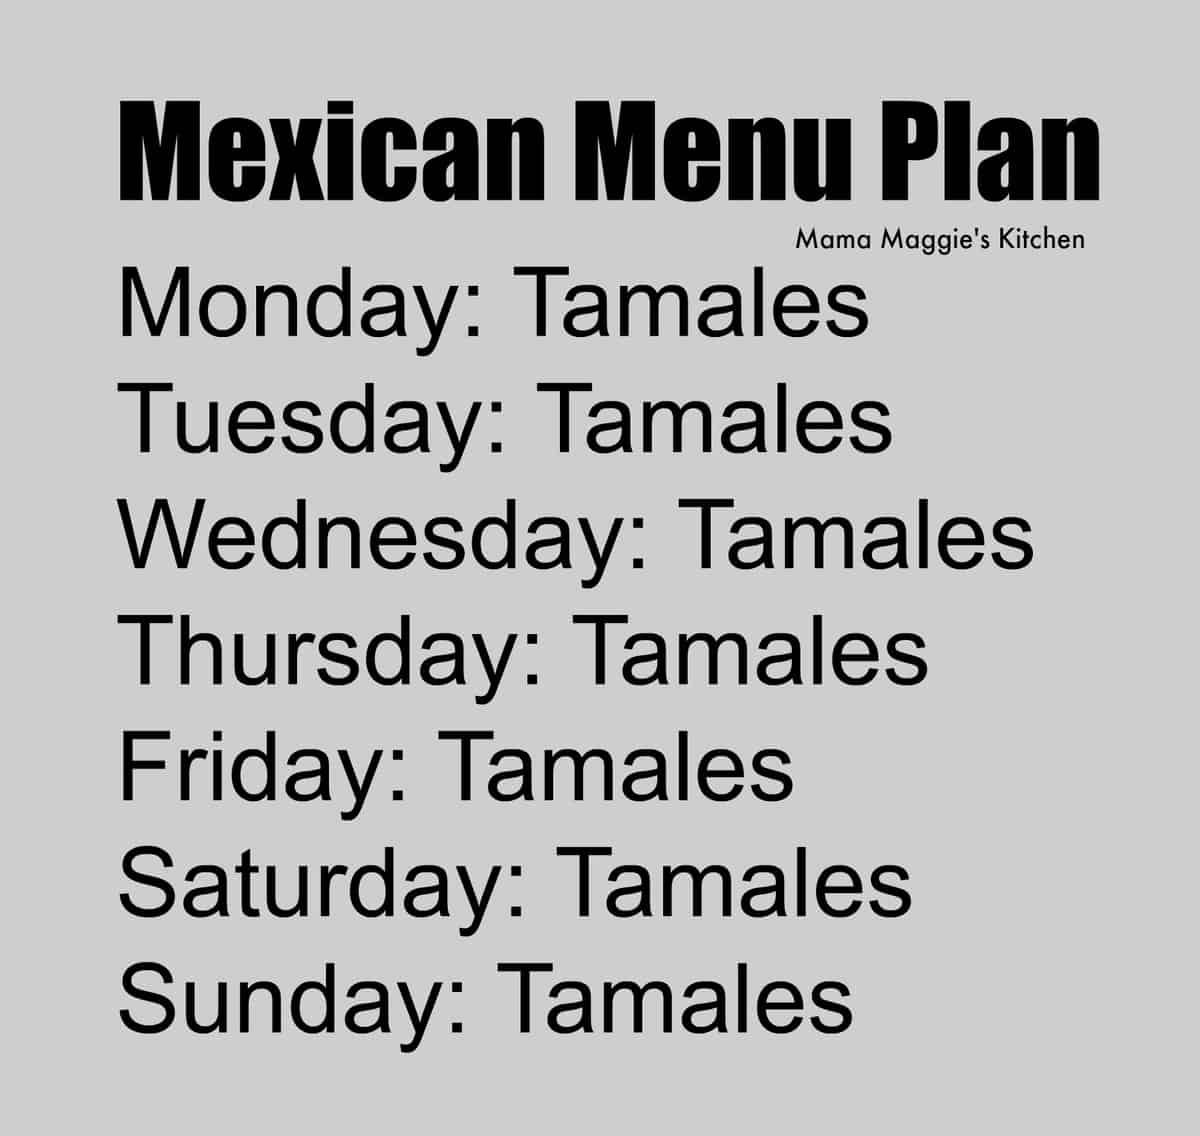 A meme with a Mexican menu plan.